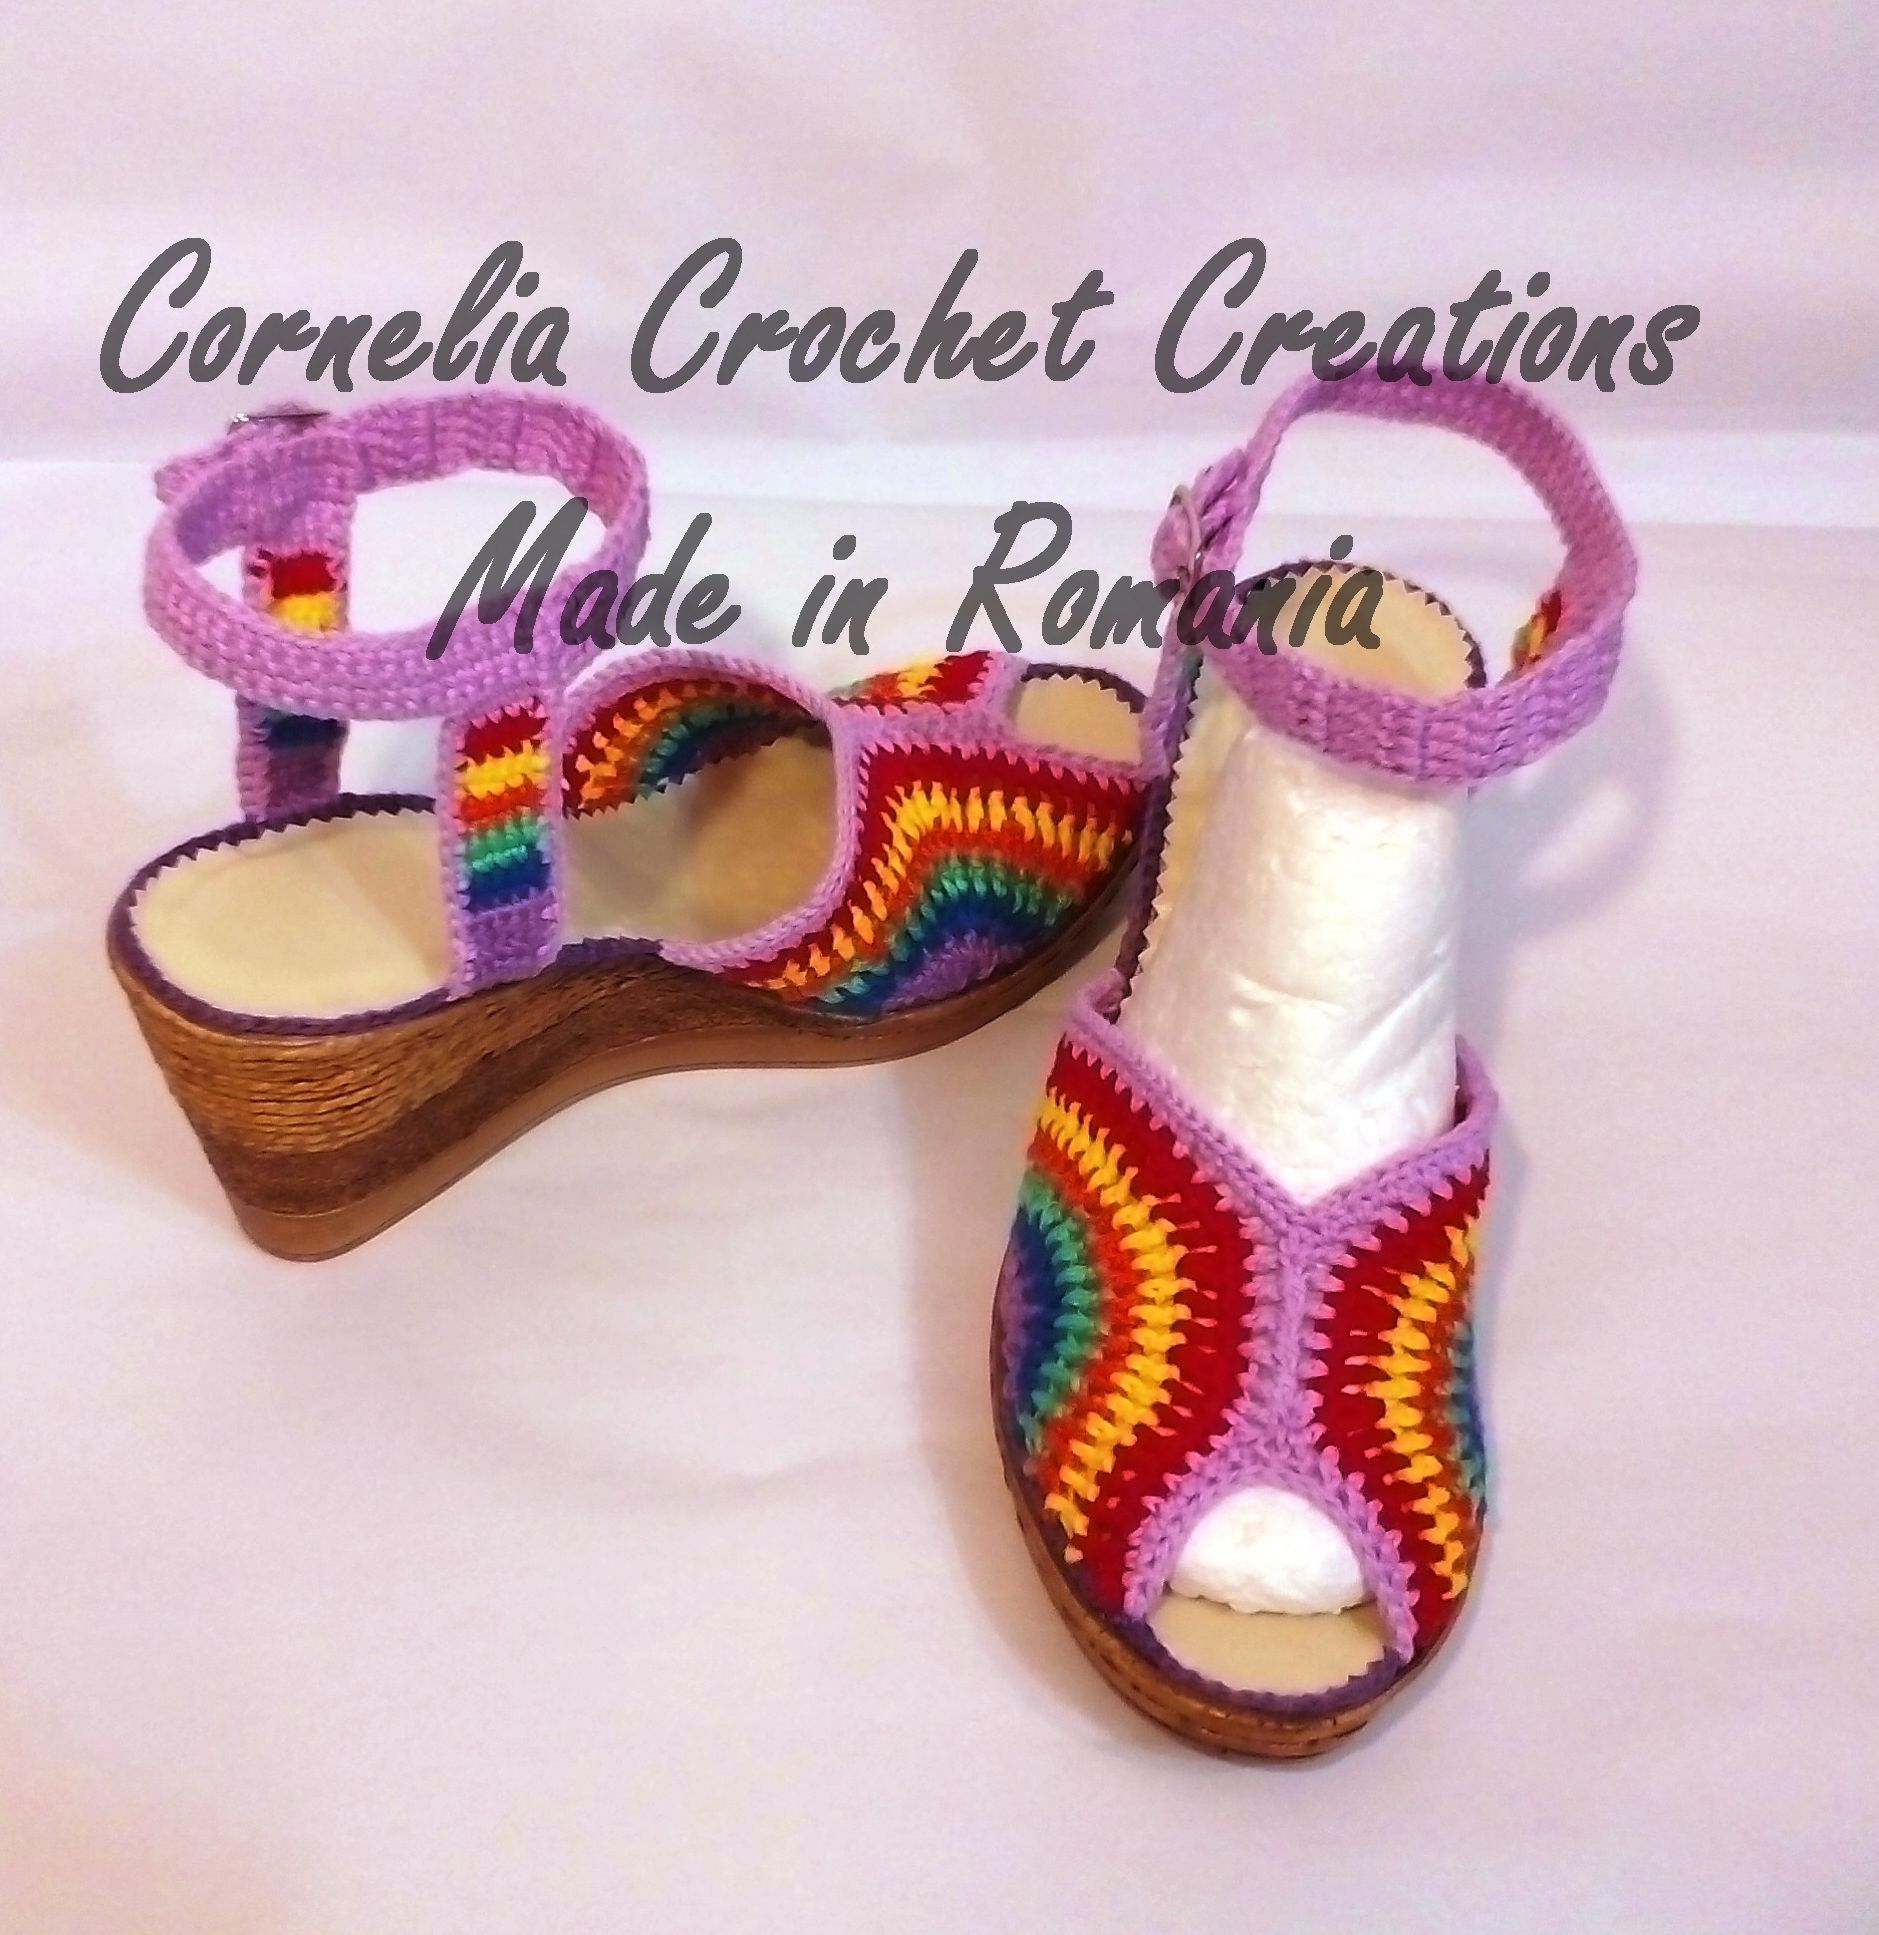 Pin von Ion Cornelia auf Sandale, pantofi, cizme ...crosetate ...